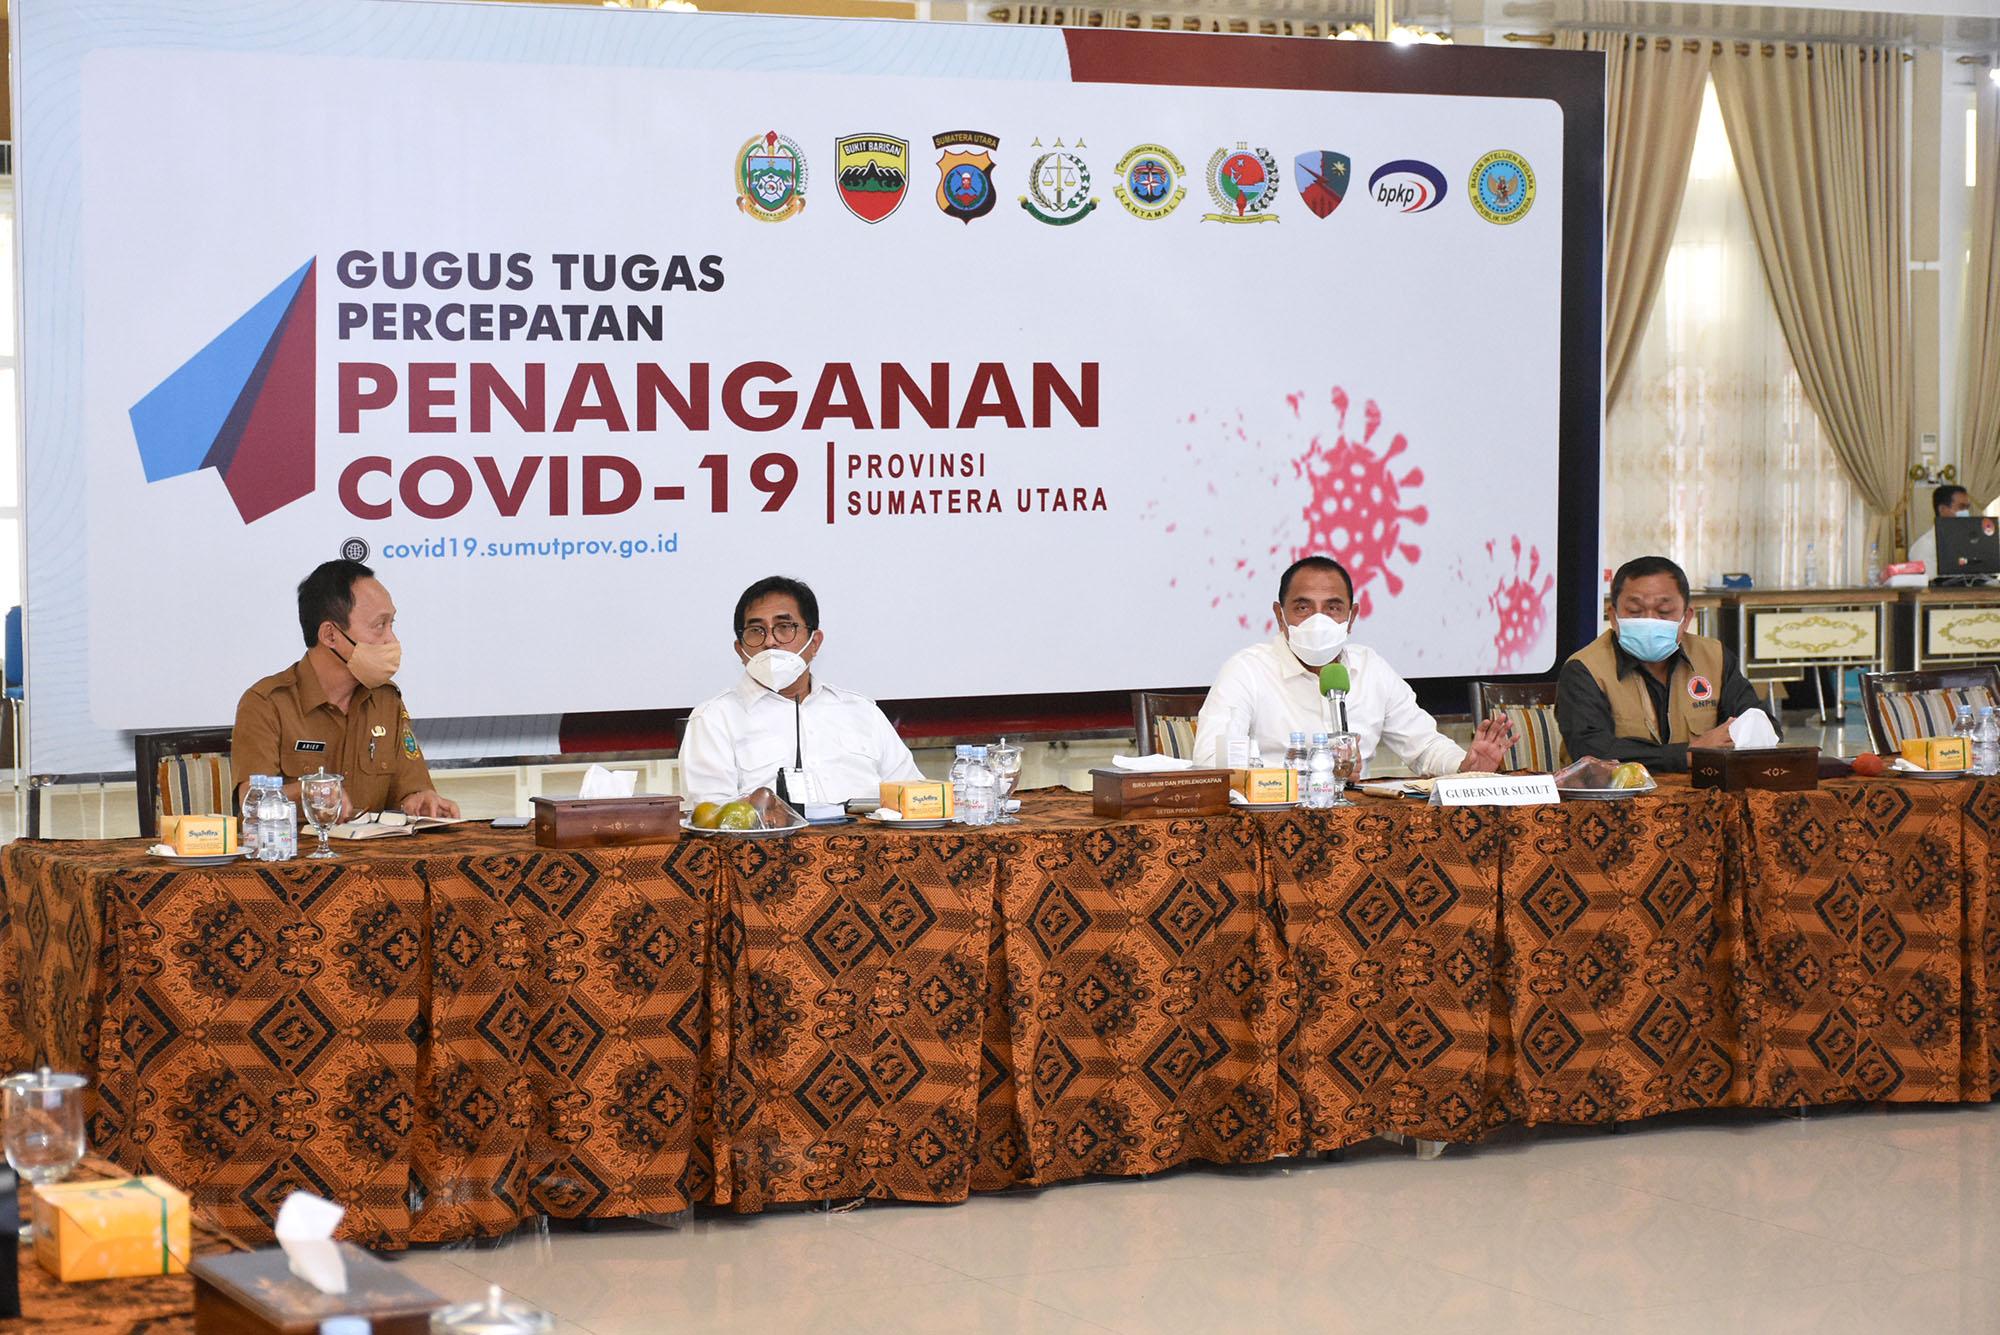 Gubernur Sumut Edy Rahmayadi memimpin Rapat Pengendalian Penumpang dalam Pengendalian Covid-19 di Pendopo Rumah Dinas Gubernur Sumut. Foto: Biro Humas dan Keprotokolan Setdaprov Sumut / Imam Syahputra).